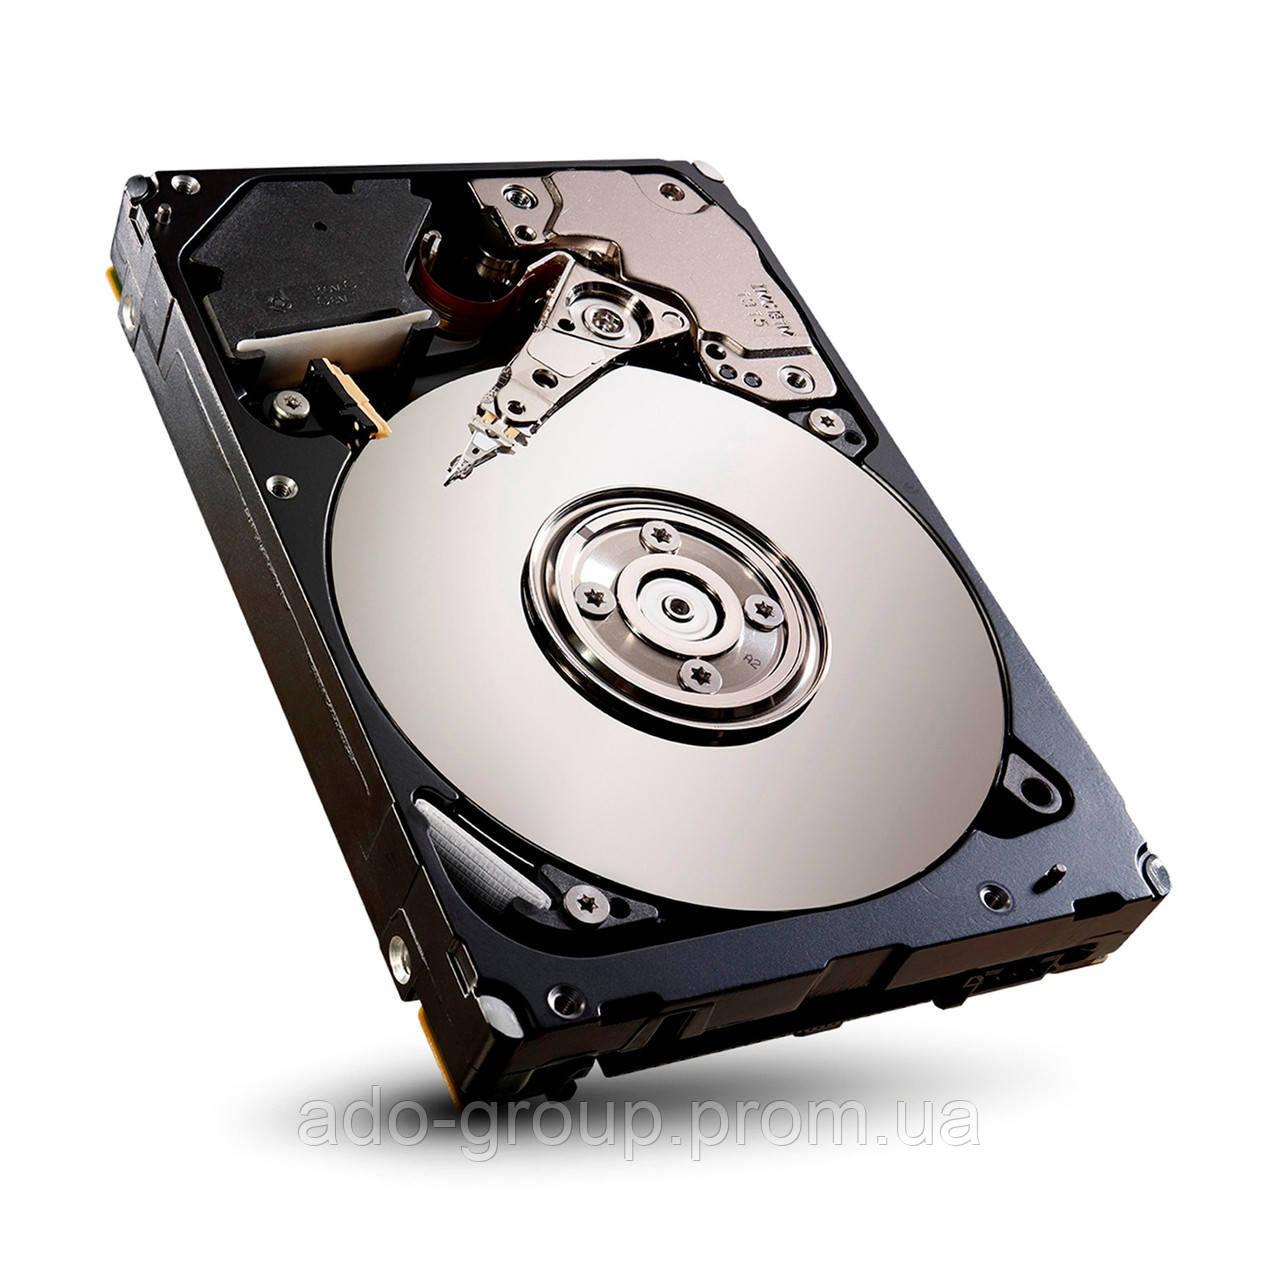 "400-AGML Жесткий диск Dell 1800GB SAS 10K  2.5"" +"